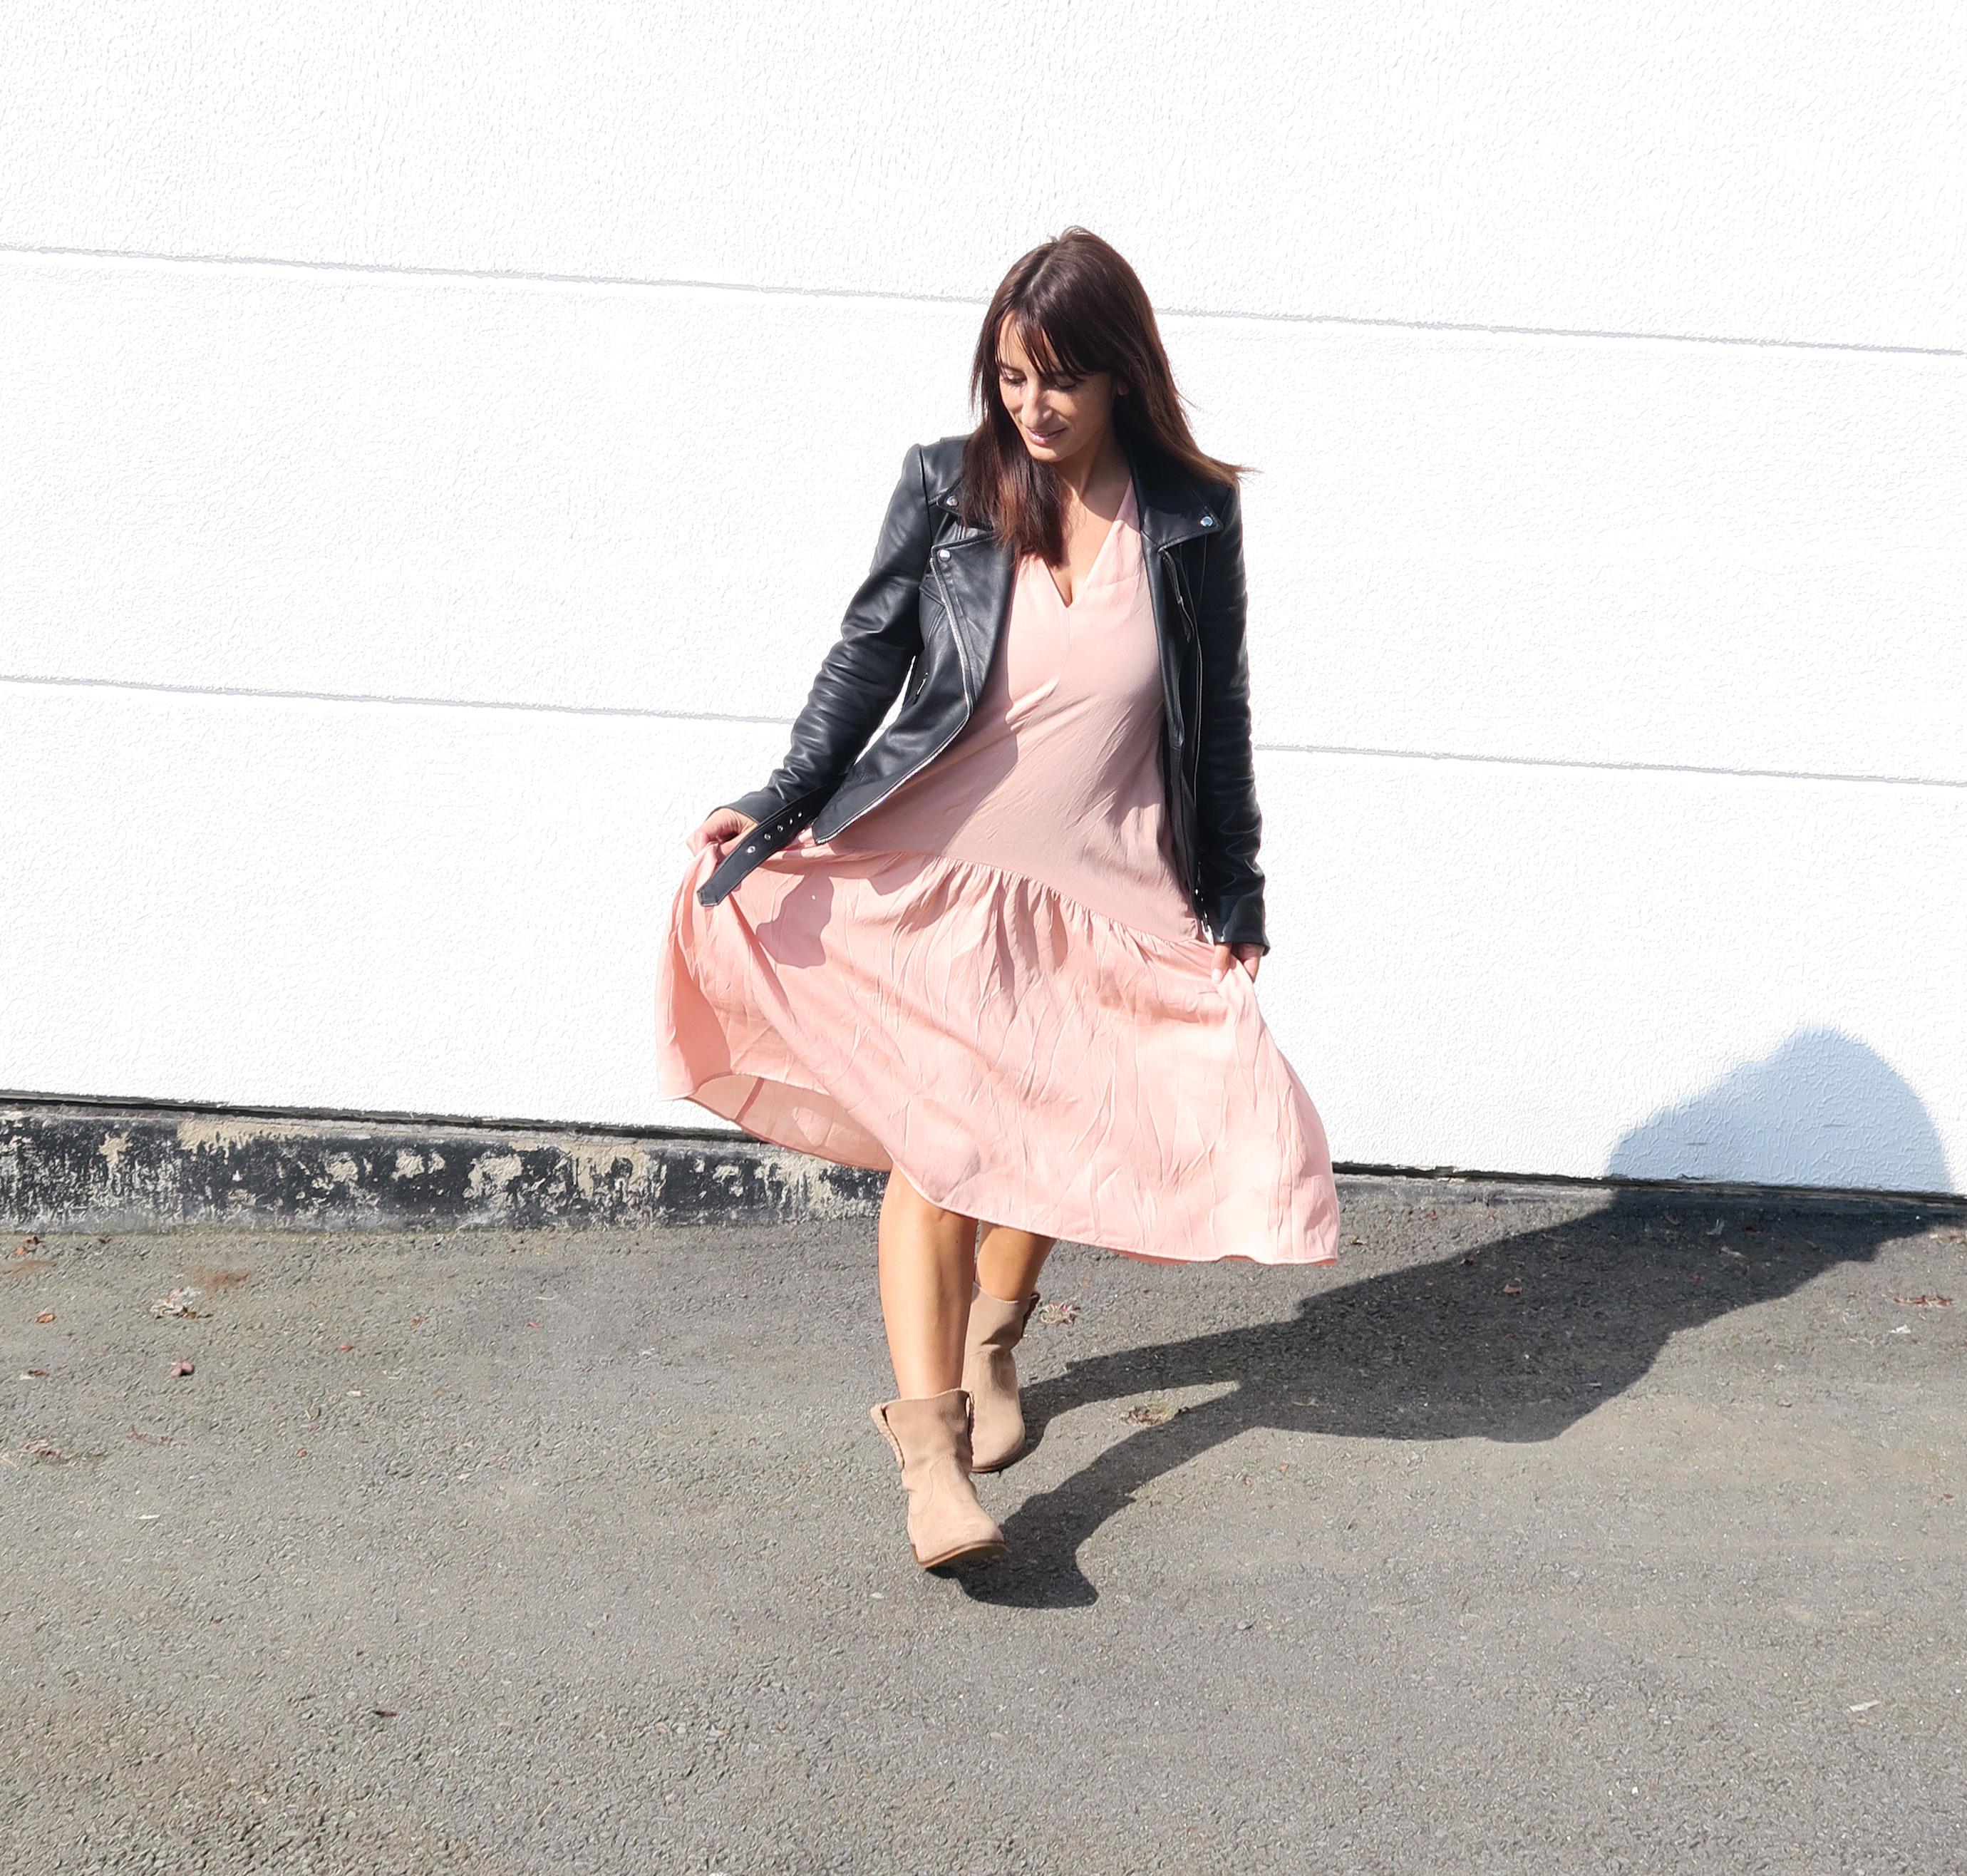 Modesalat-blogger-streetstyle-leather-bloggerstyle-ruffles-dress-4